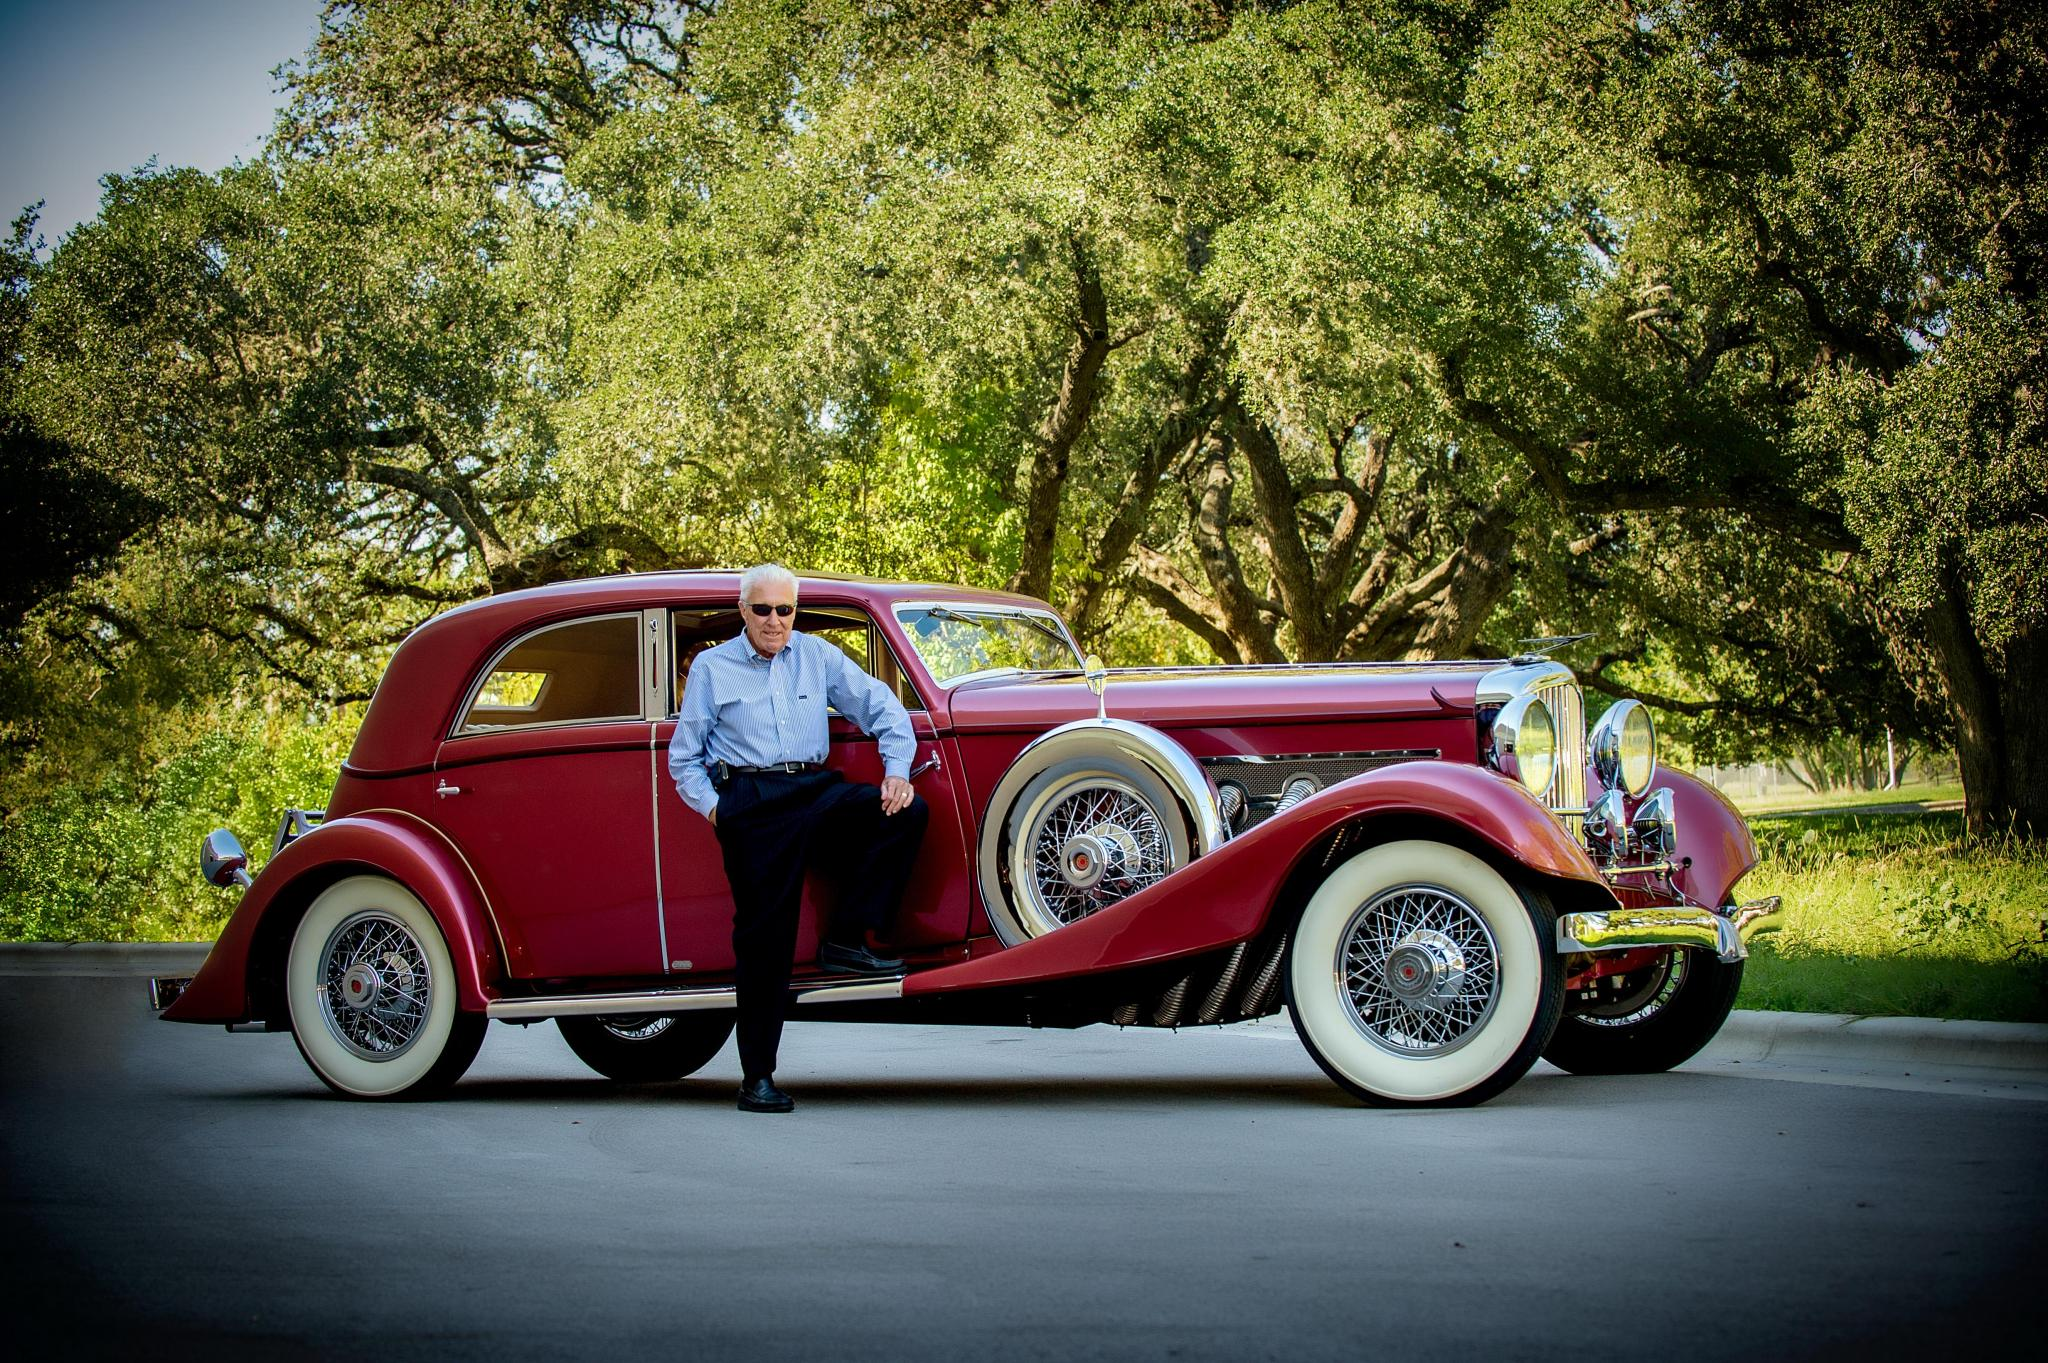 Dicks Classic Car Garage To Close Morph To Nonprofit San Marcos - Classic car museum